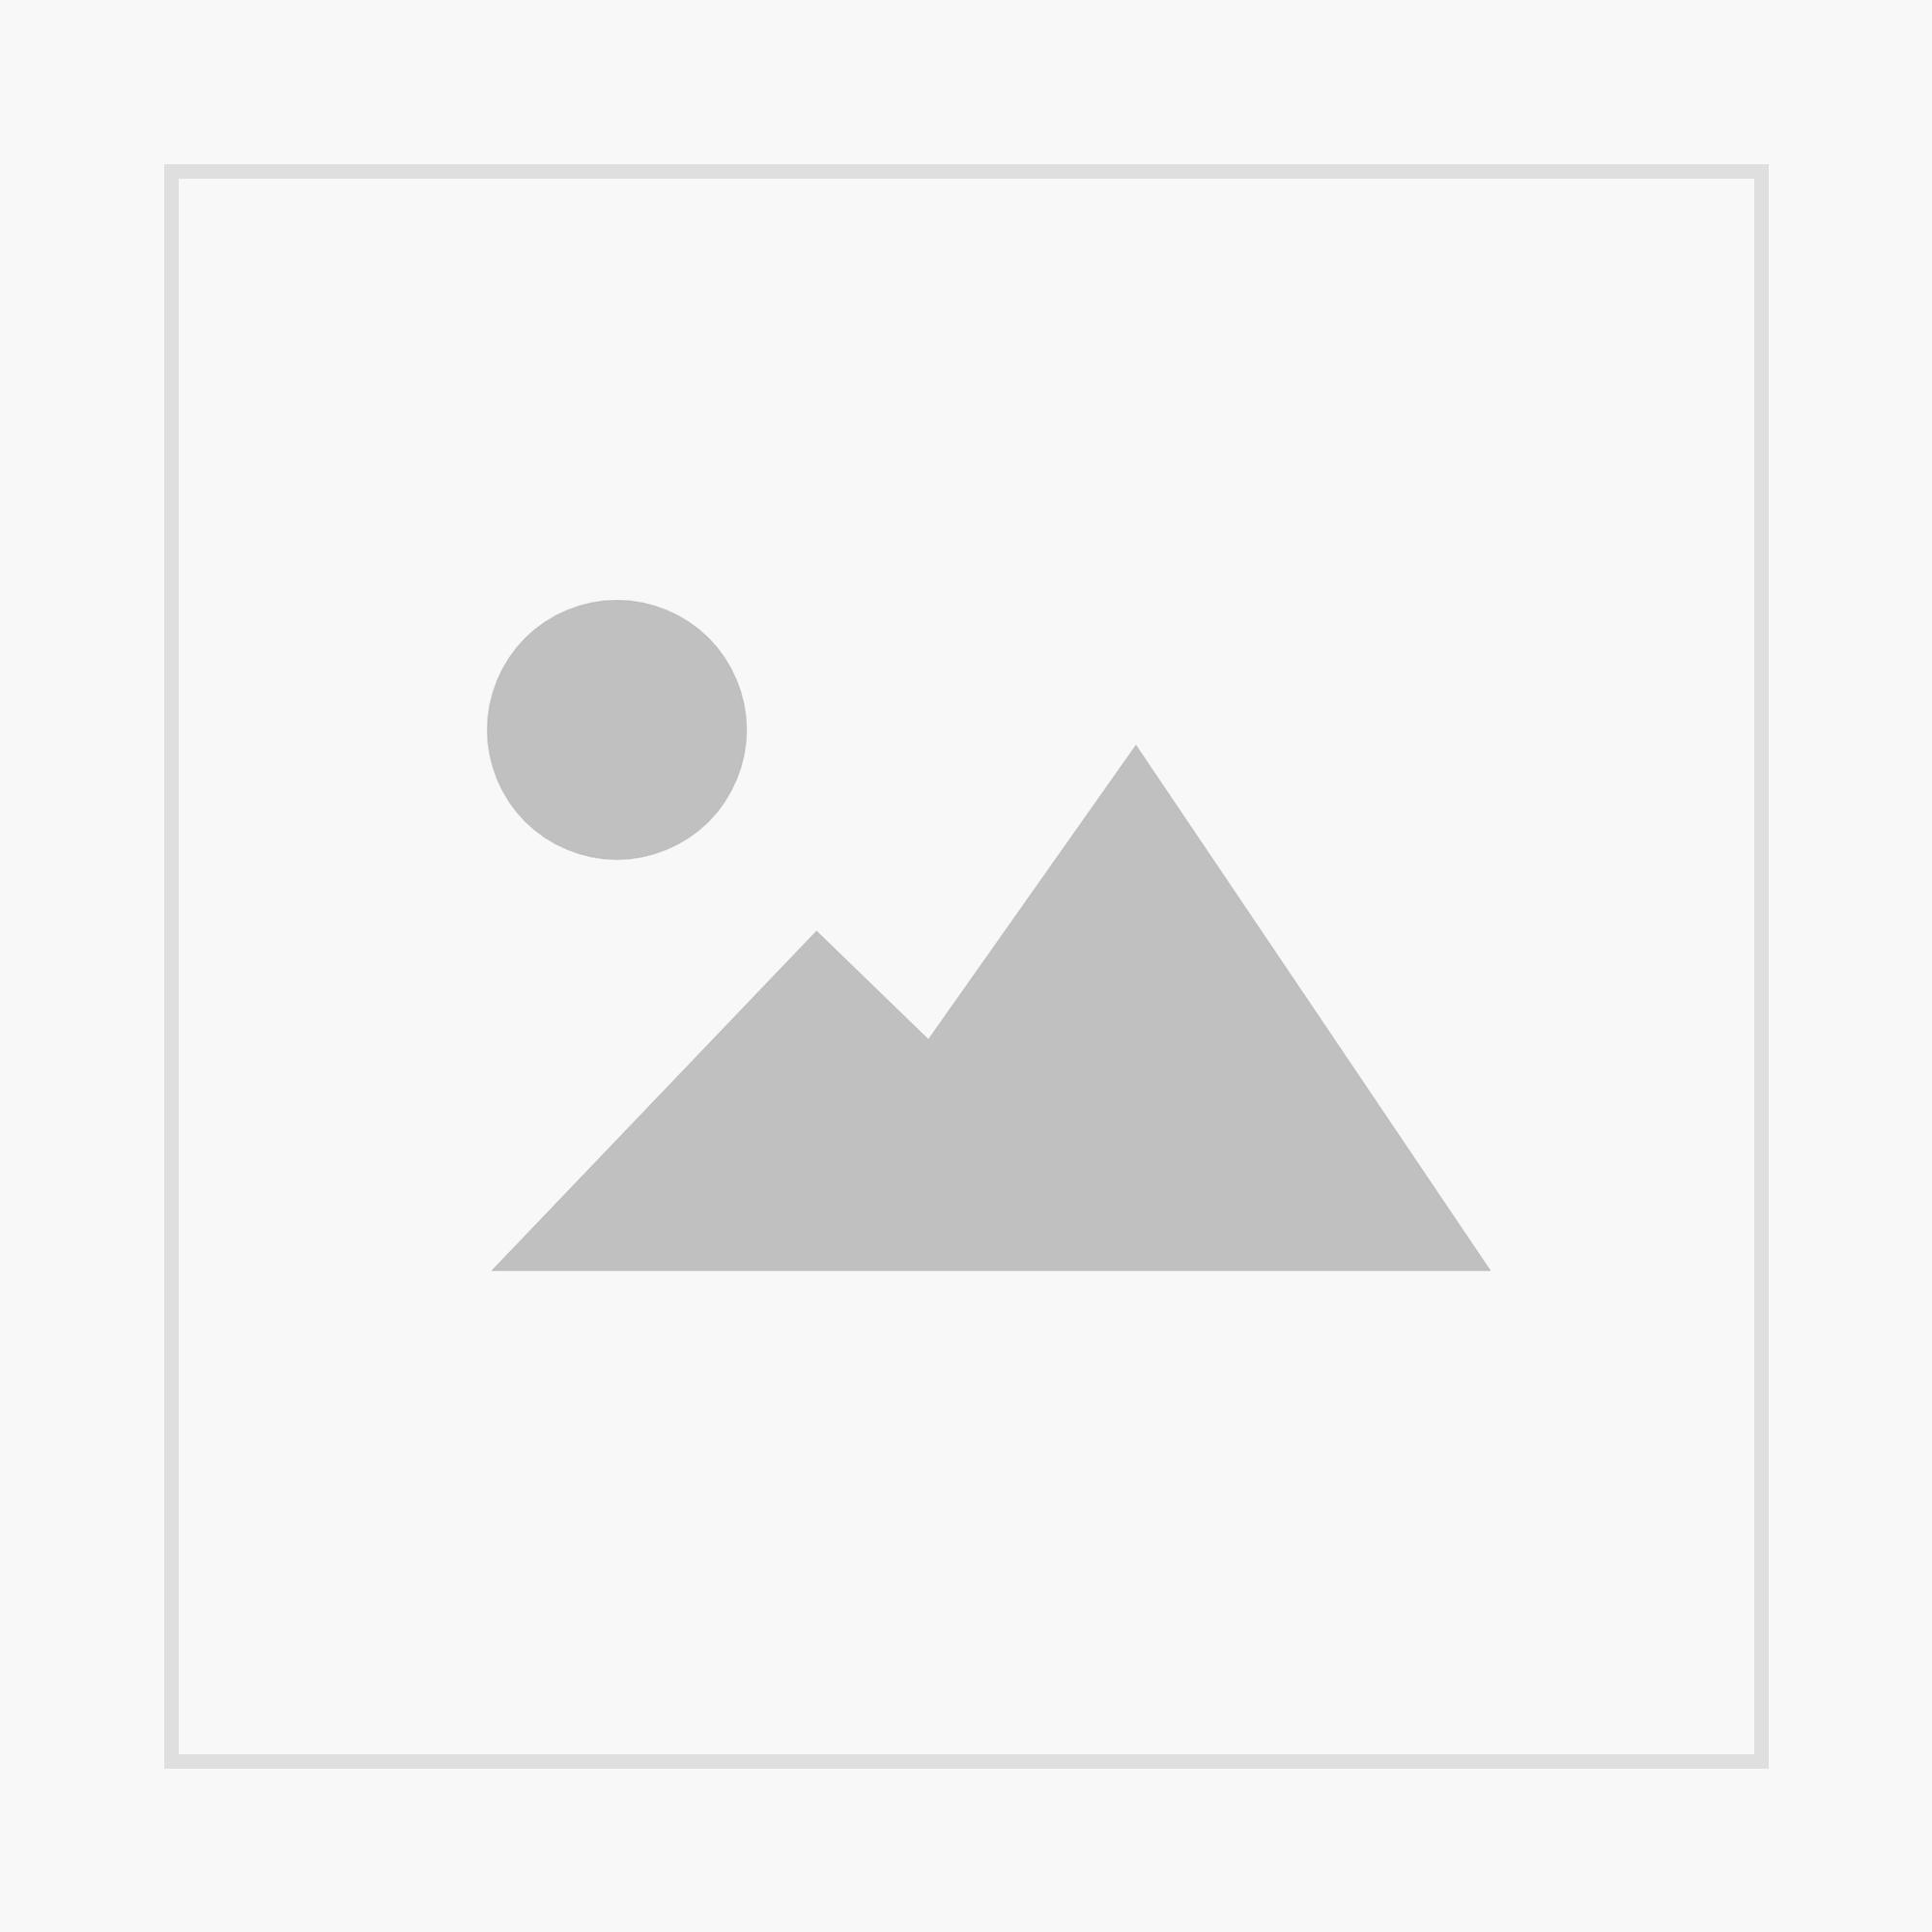 EPUB: 25 begeisternde Erdbeerrezepte